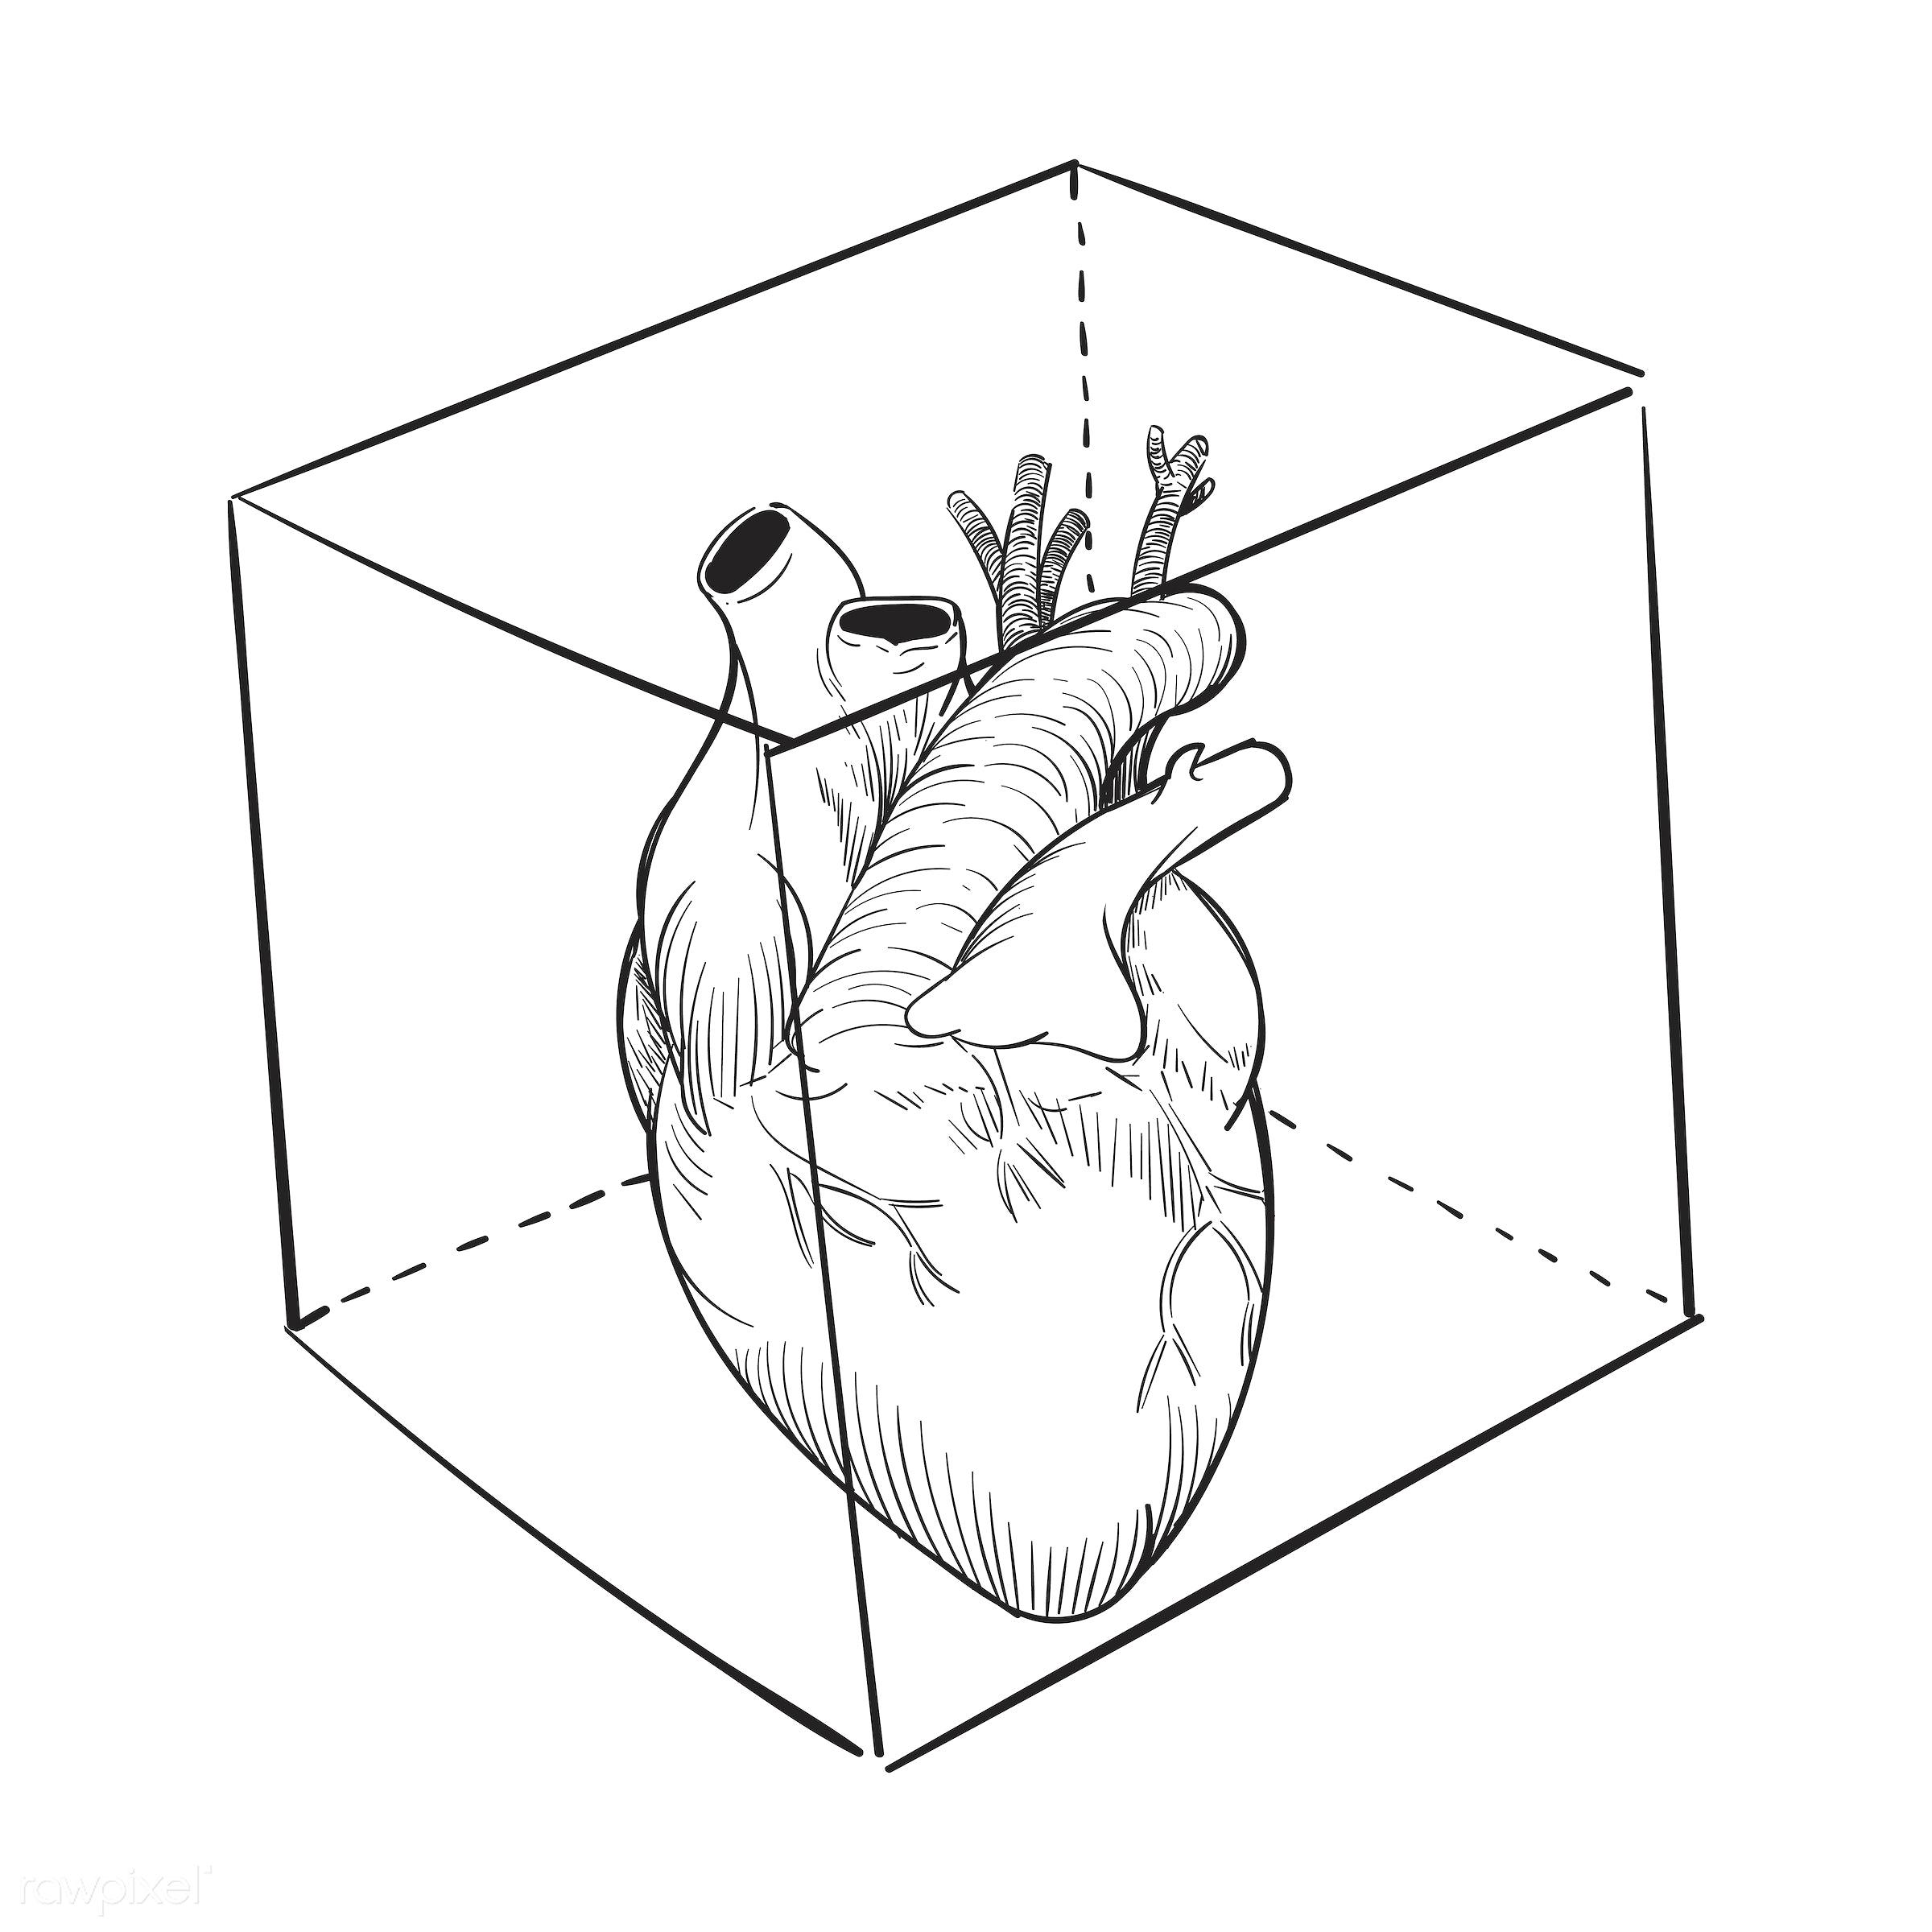 Hand drawing illustration of captived heart - artwork, captive, creativity, design, draw, drawing, drawn, emotion,...